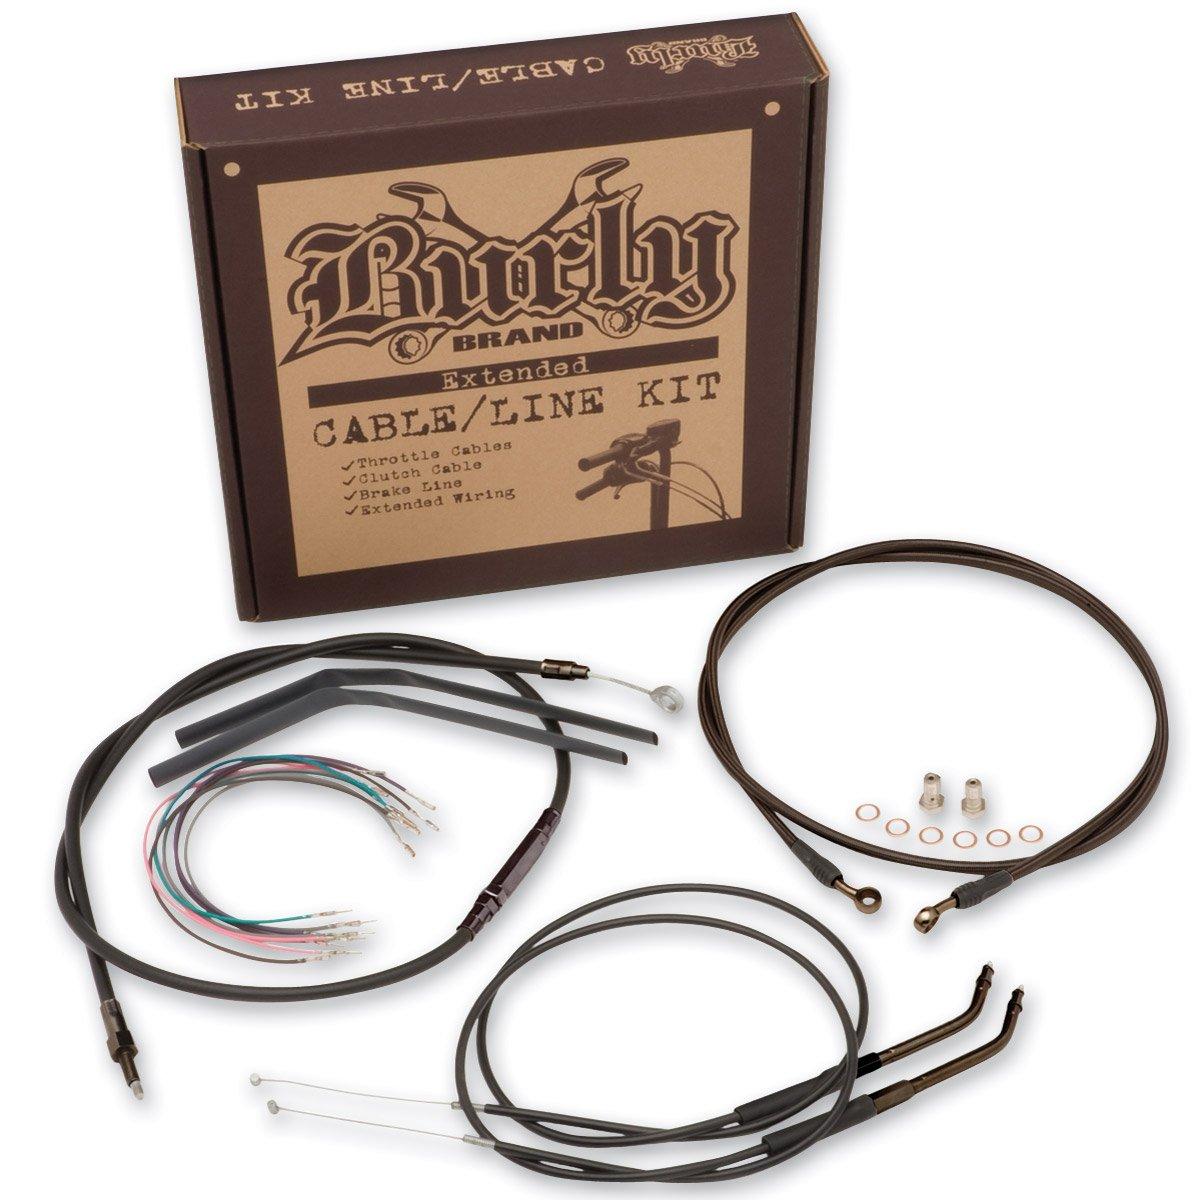 Ape Hanger Cable//Brake//Wiring Kit B30-1017 Burly Brand Black 18/&Prime